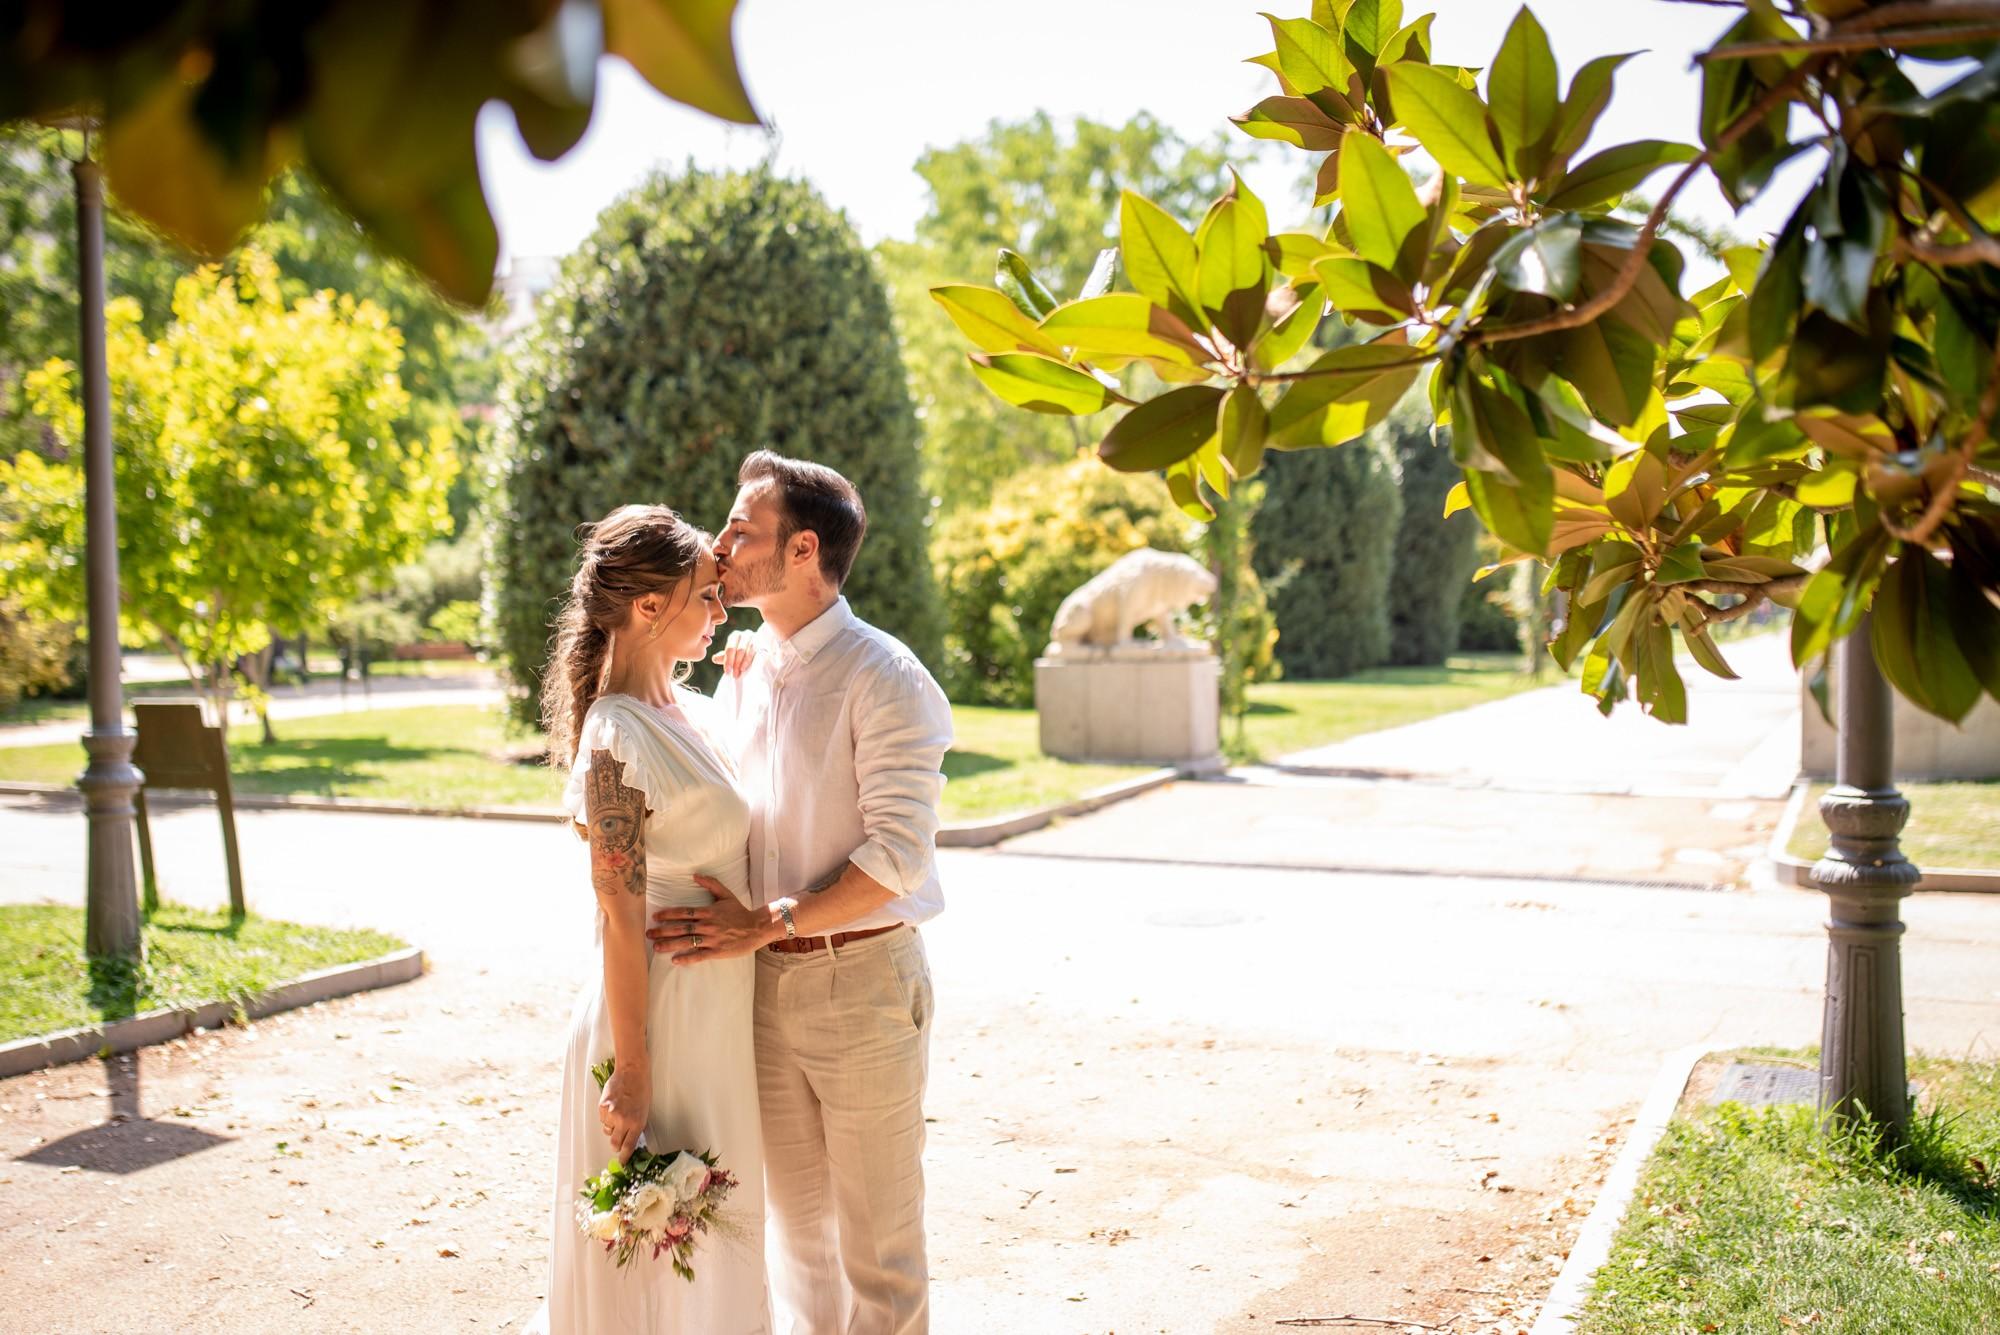 fotografos-boda-madrid-514875